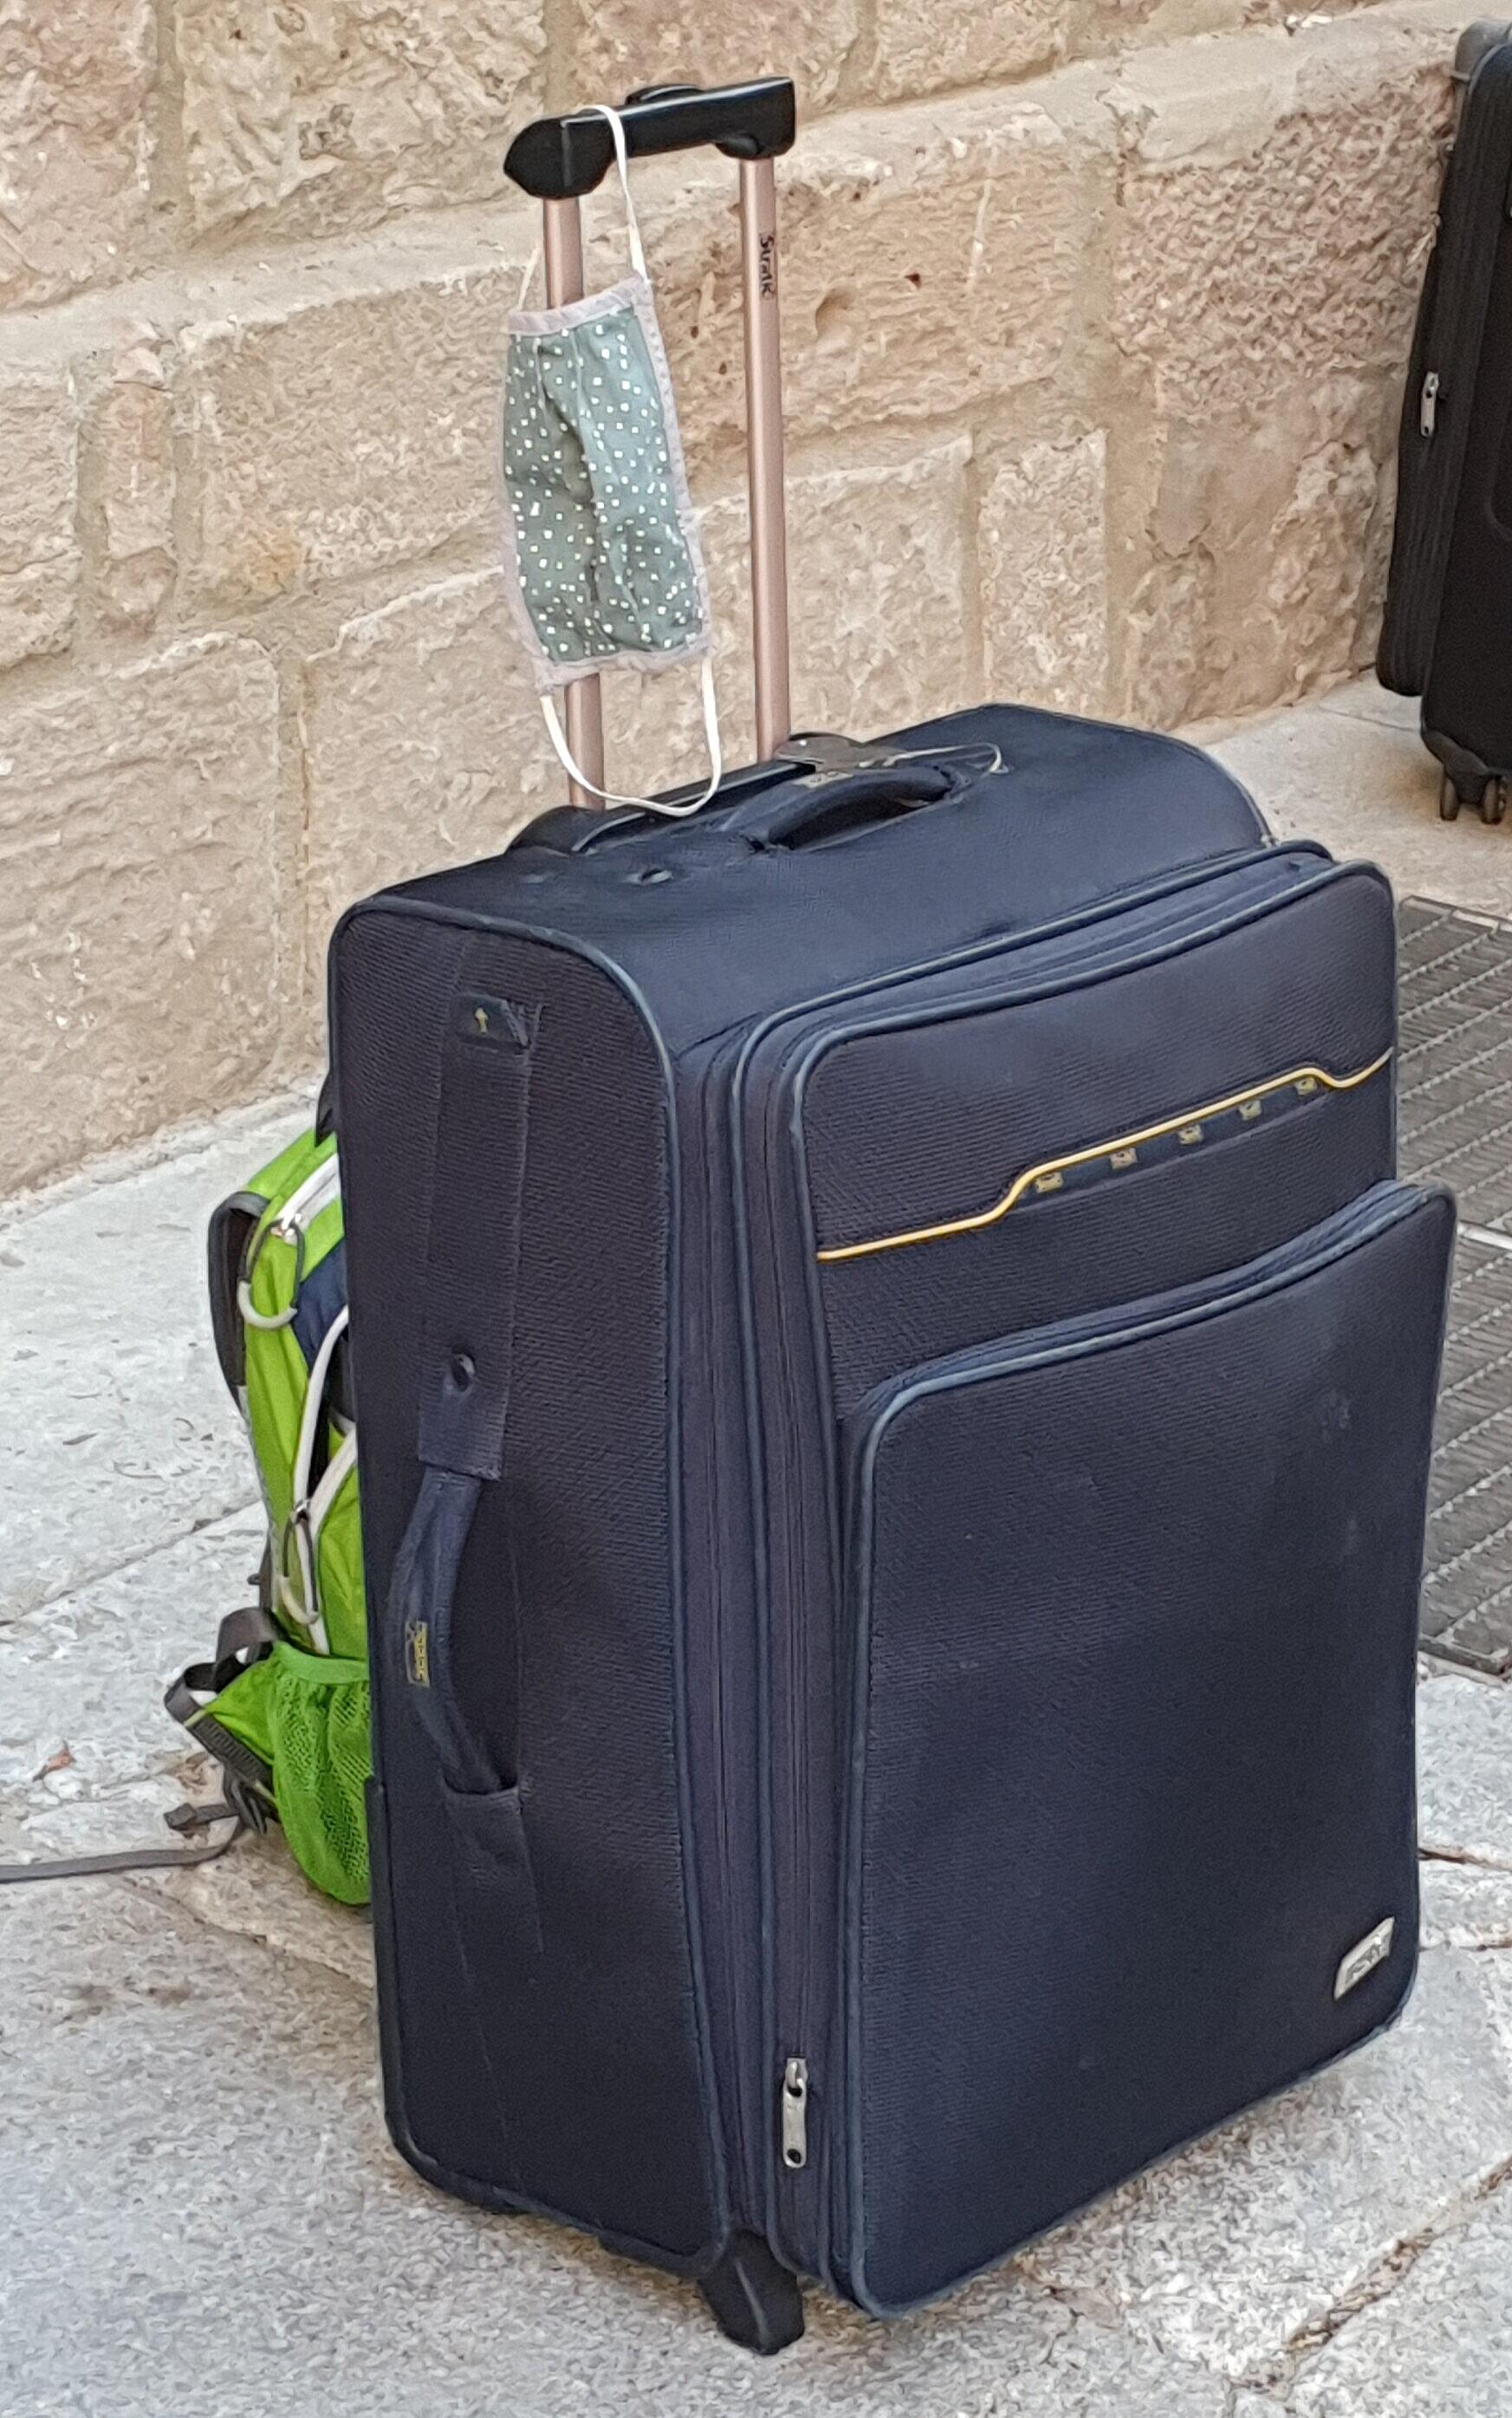 Foto Koffer mit Alltagsmasken. Foto: D.Krok